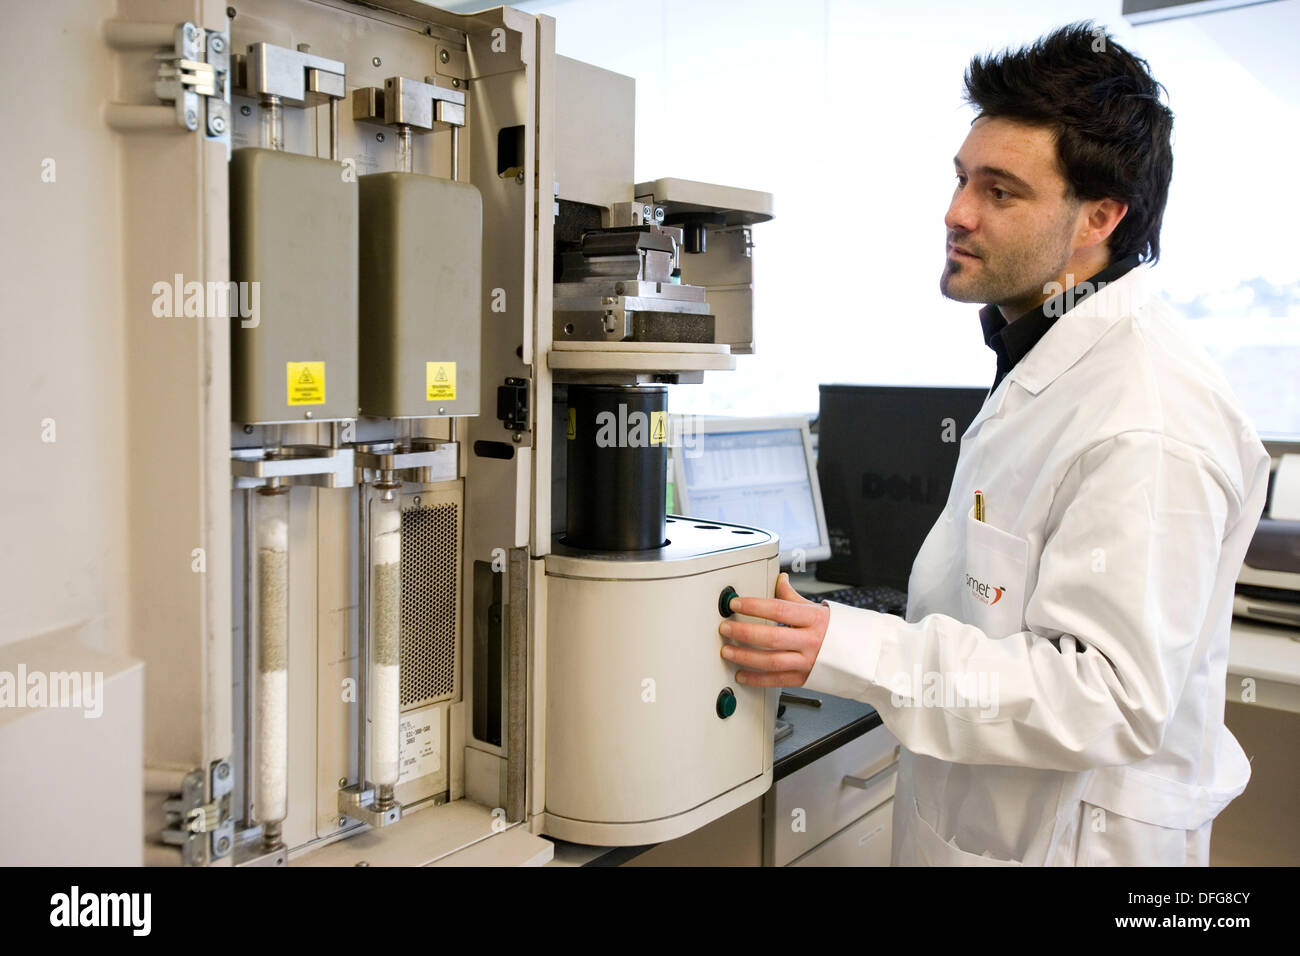 Automated analyzer of Nitrogen, Hydrogen and Oxygen. Chemical characterization laboratory. Fundacion Inasmet-Tecnalia. - Stock Image